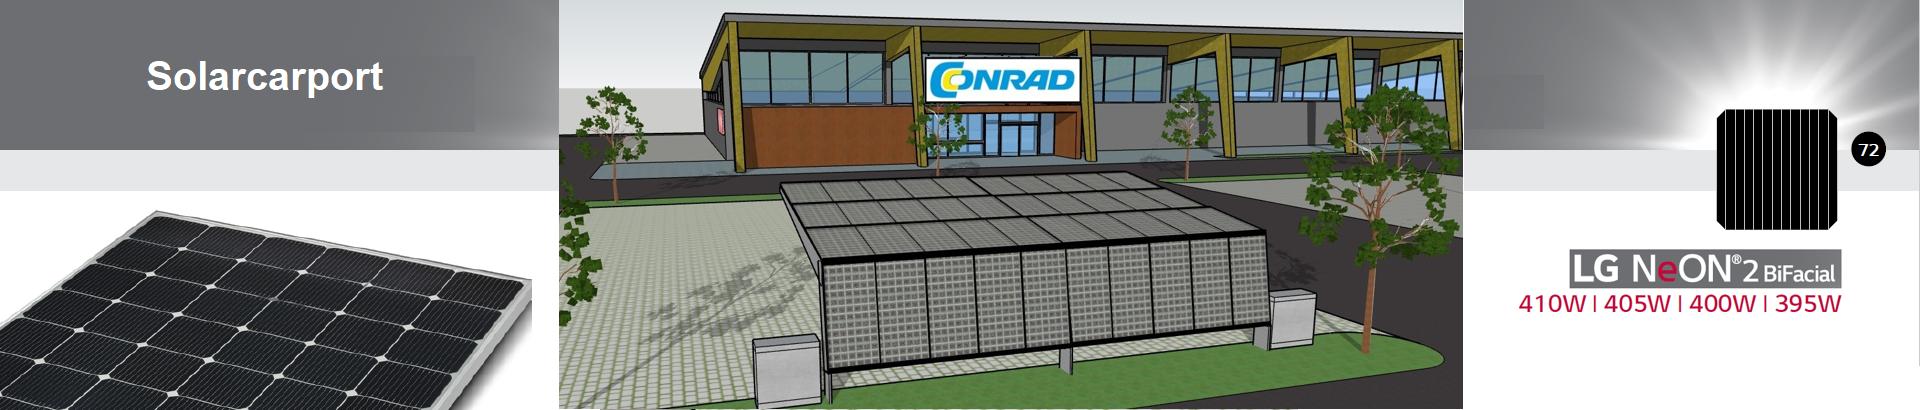 Solarcarport for four 10-40 mit Ladestation